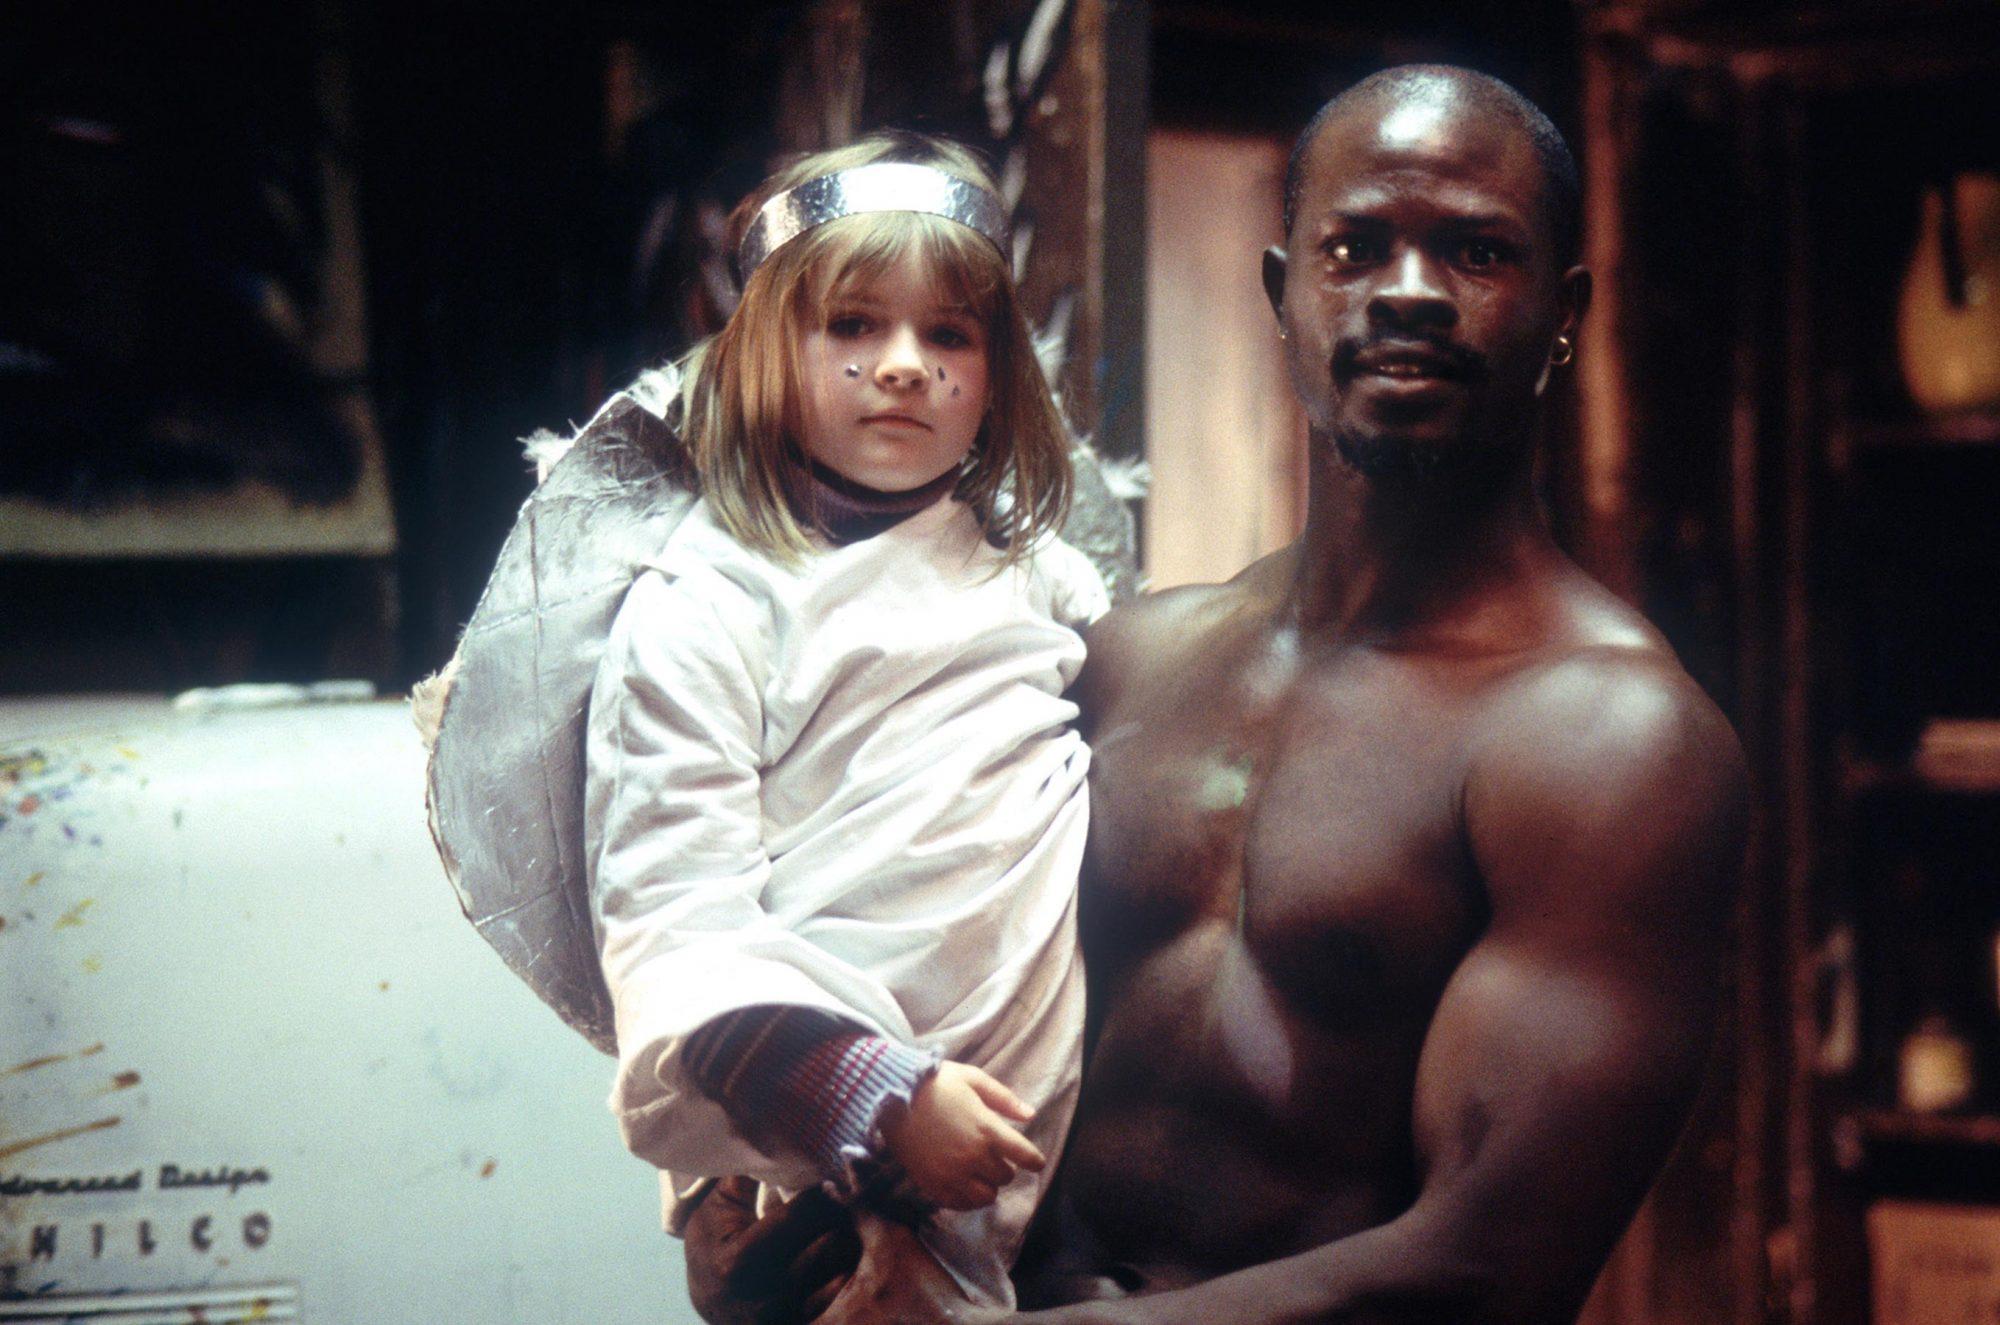 IN AMERICA, Emma Bolger, Djimon Hounsou, 2002, (c) Fox Searchlight/courtesy Everett Collection